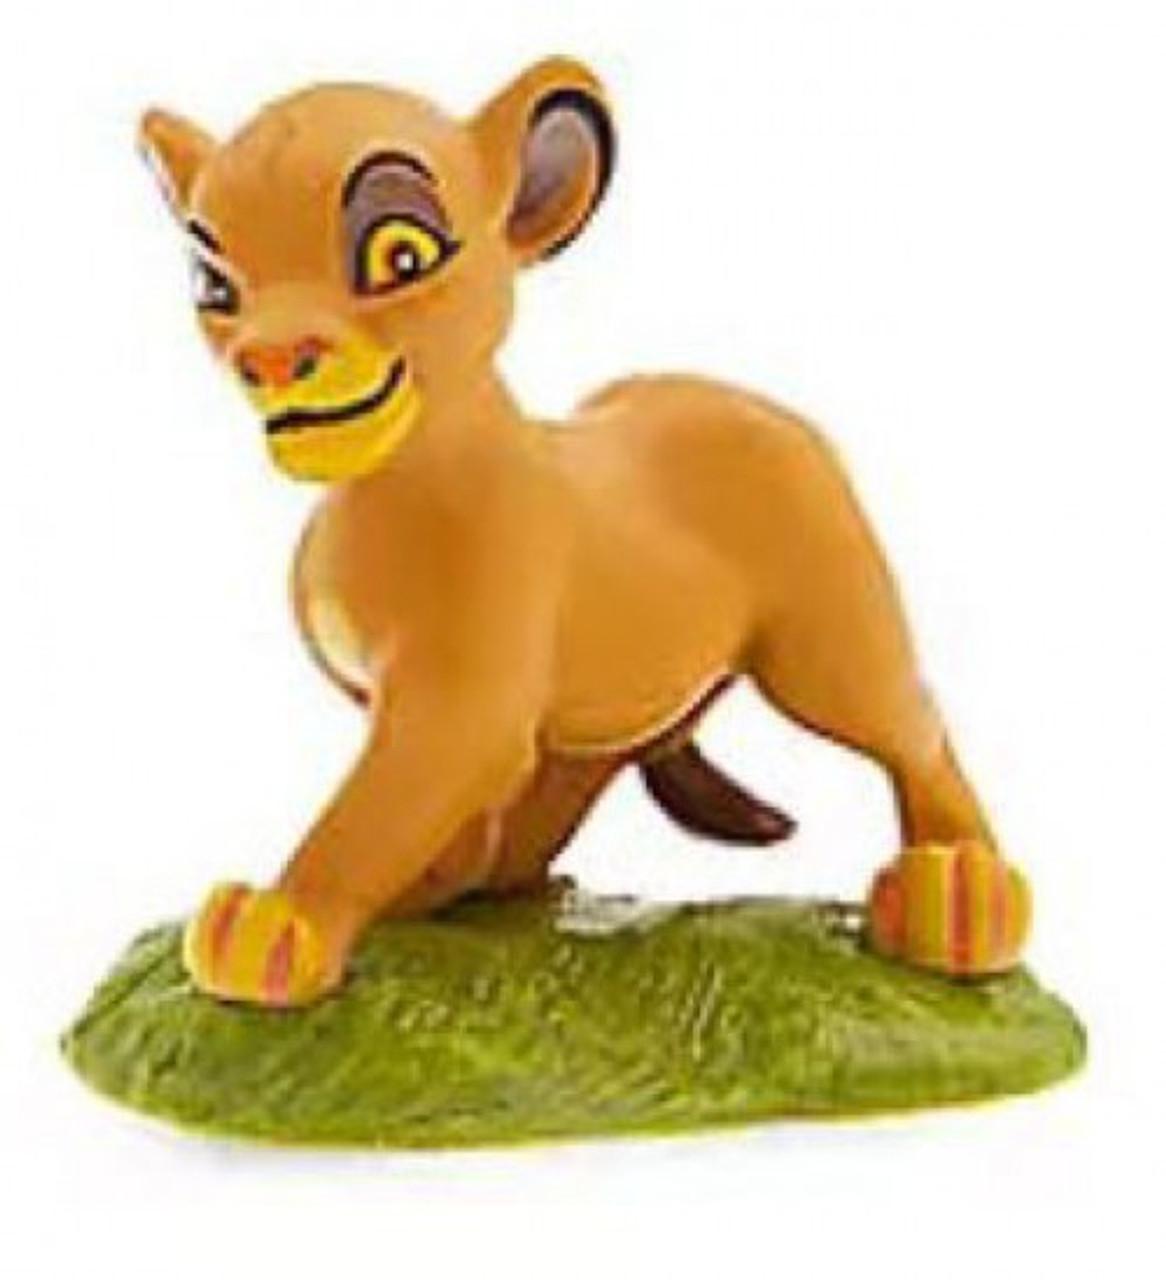 Disney The Lion King Scar 3-Inch PVC Figure Prowling Loose